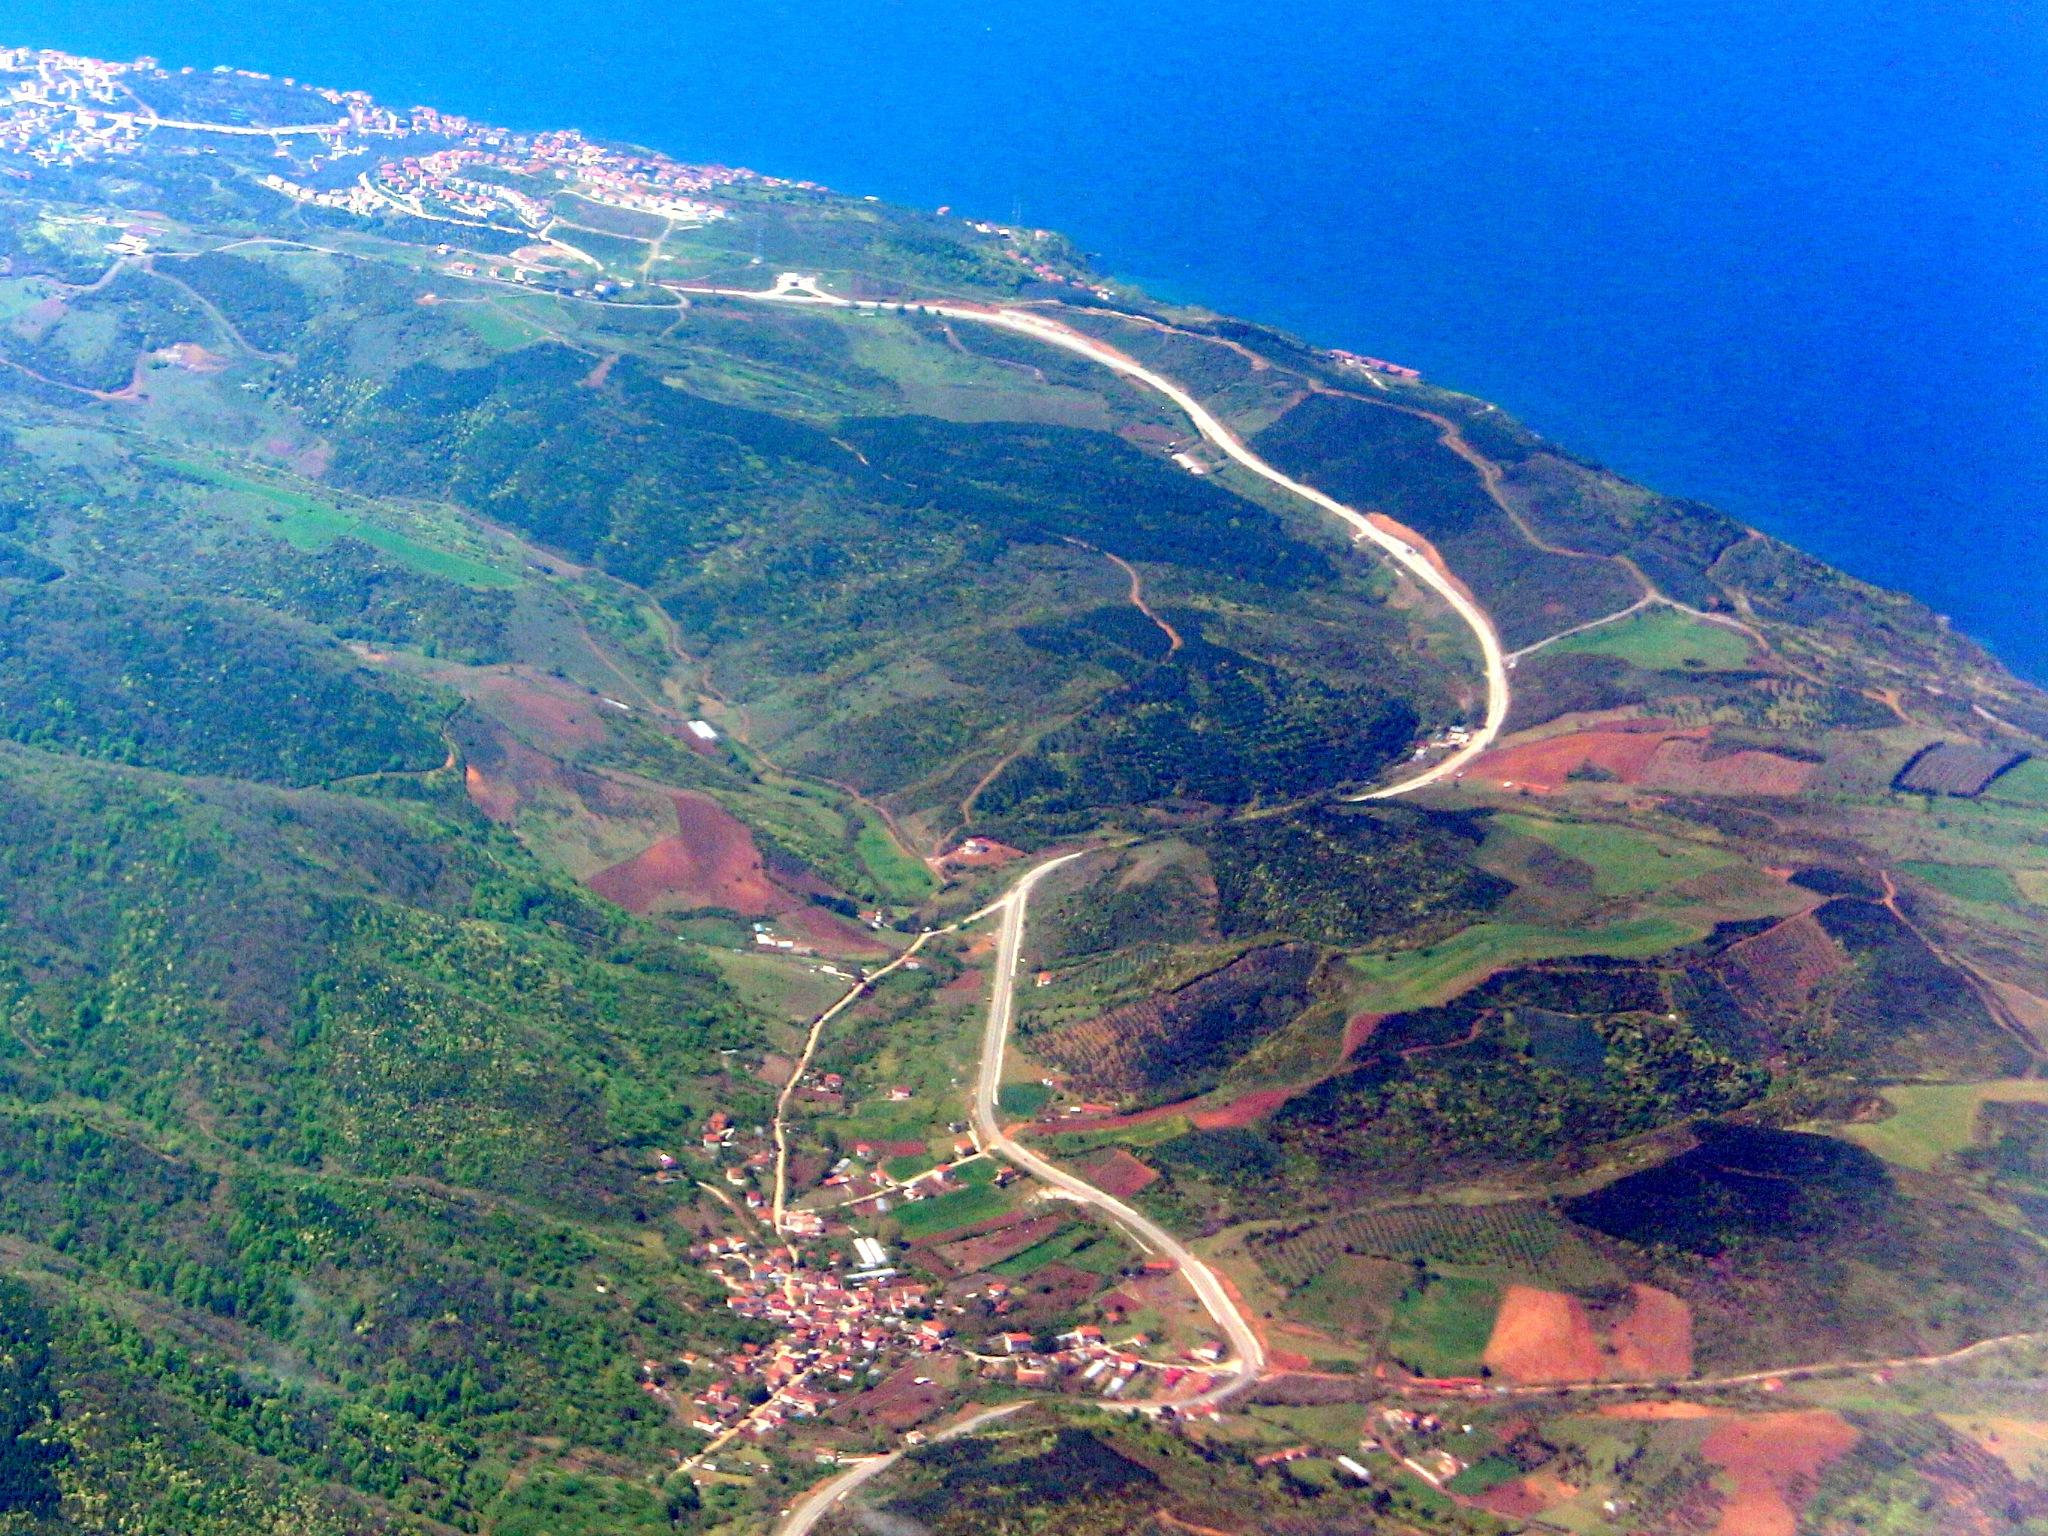 5880...view from the plane... by Bedirhan Küpeli